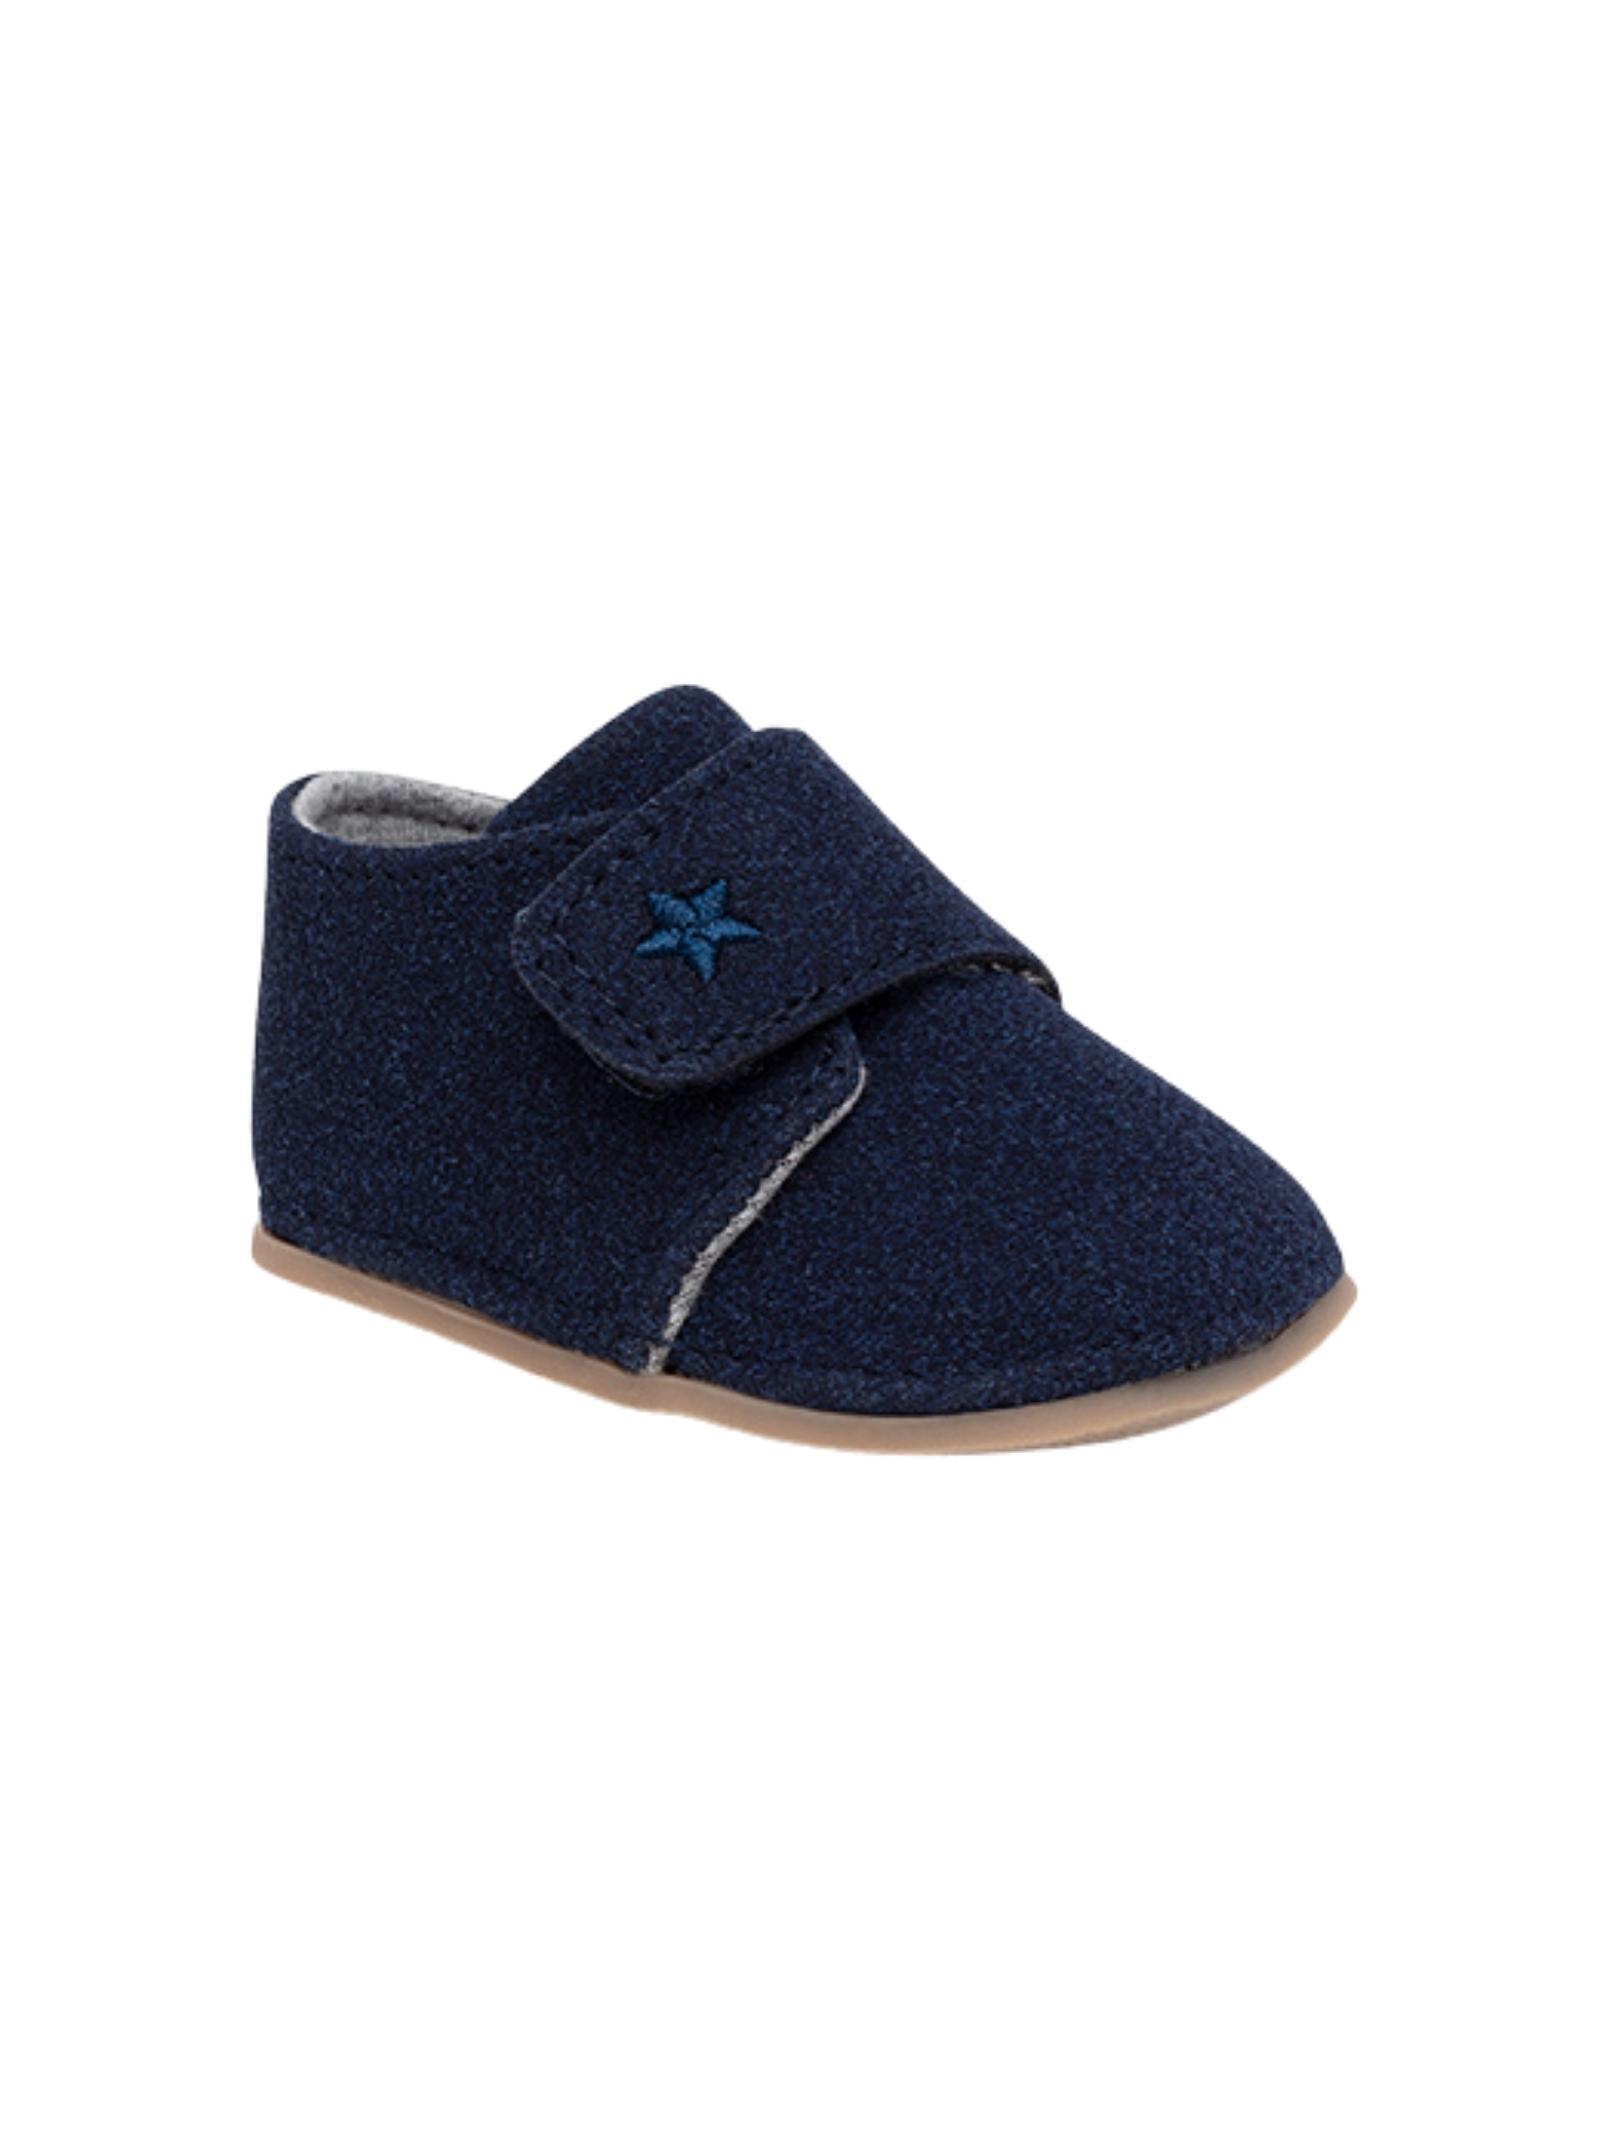 Stella Newborn Shoes MAYORAL NEWBORN | Shoes | 9446021